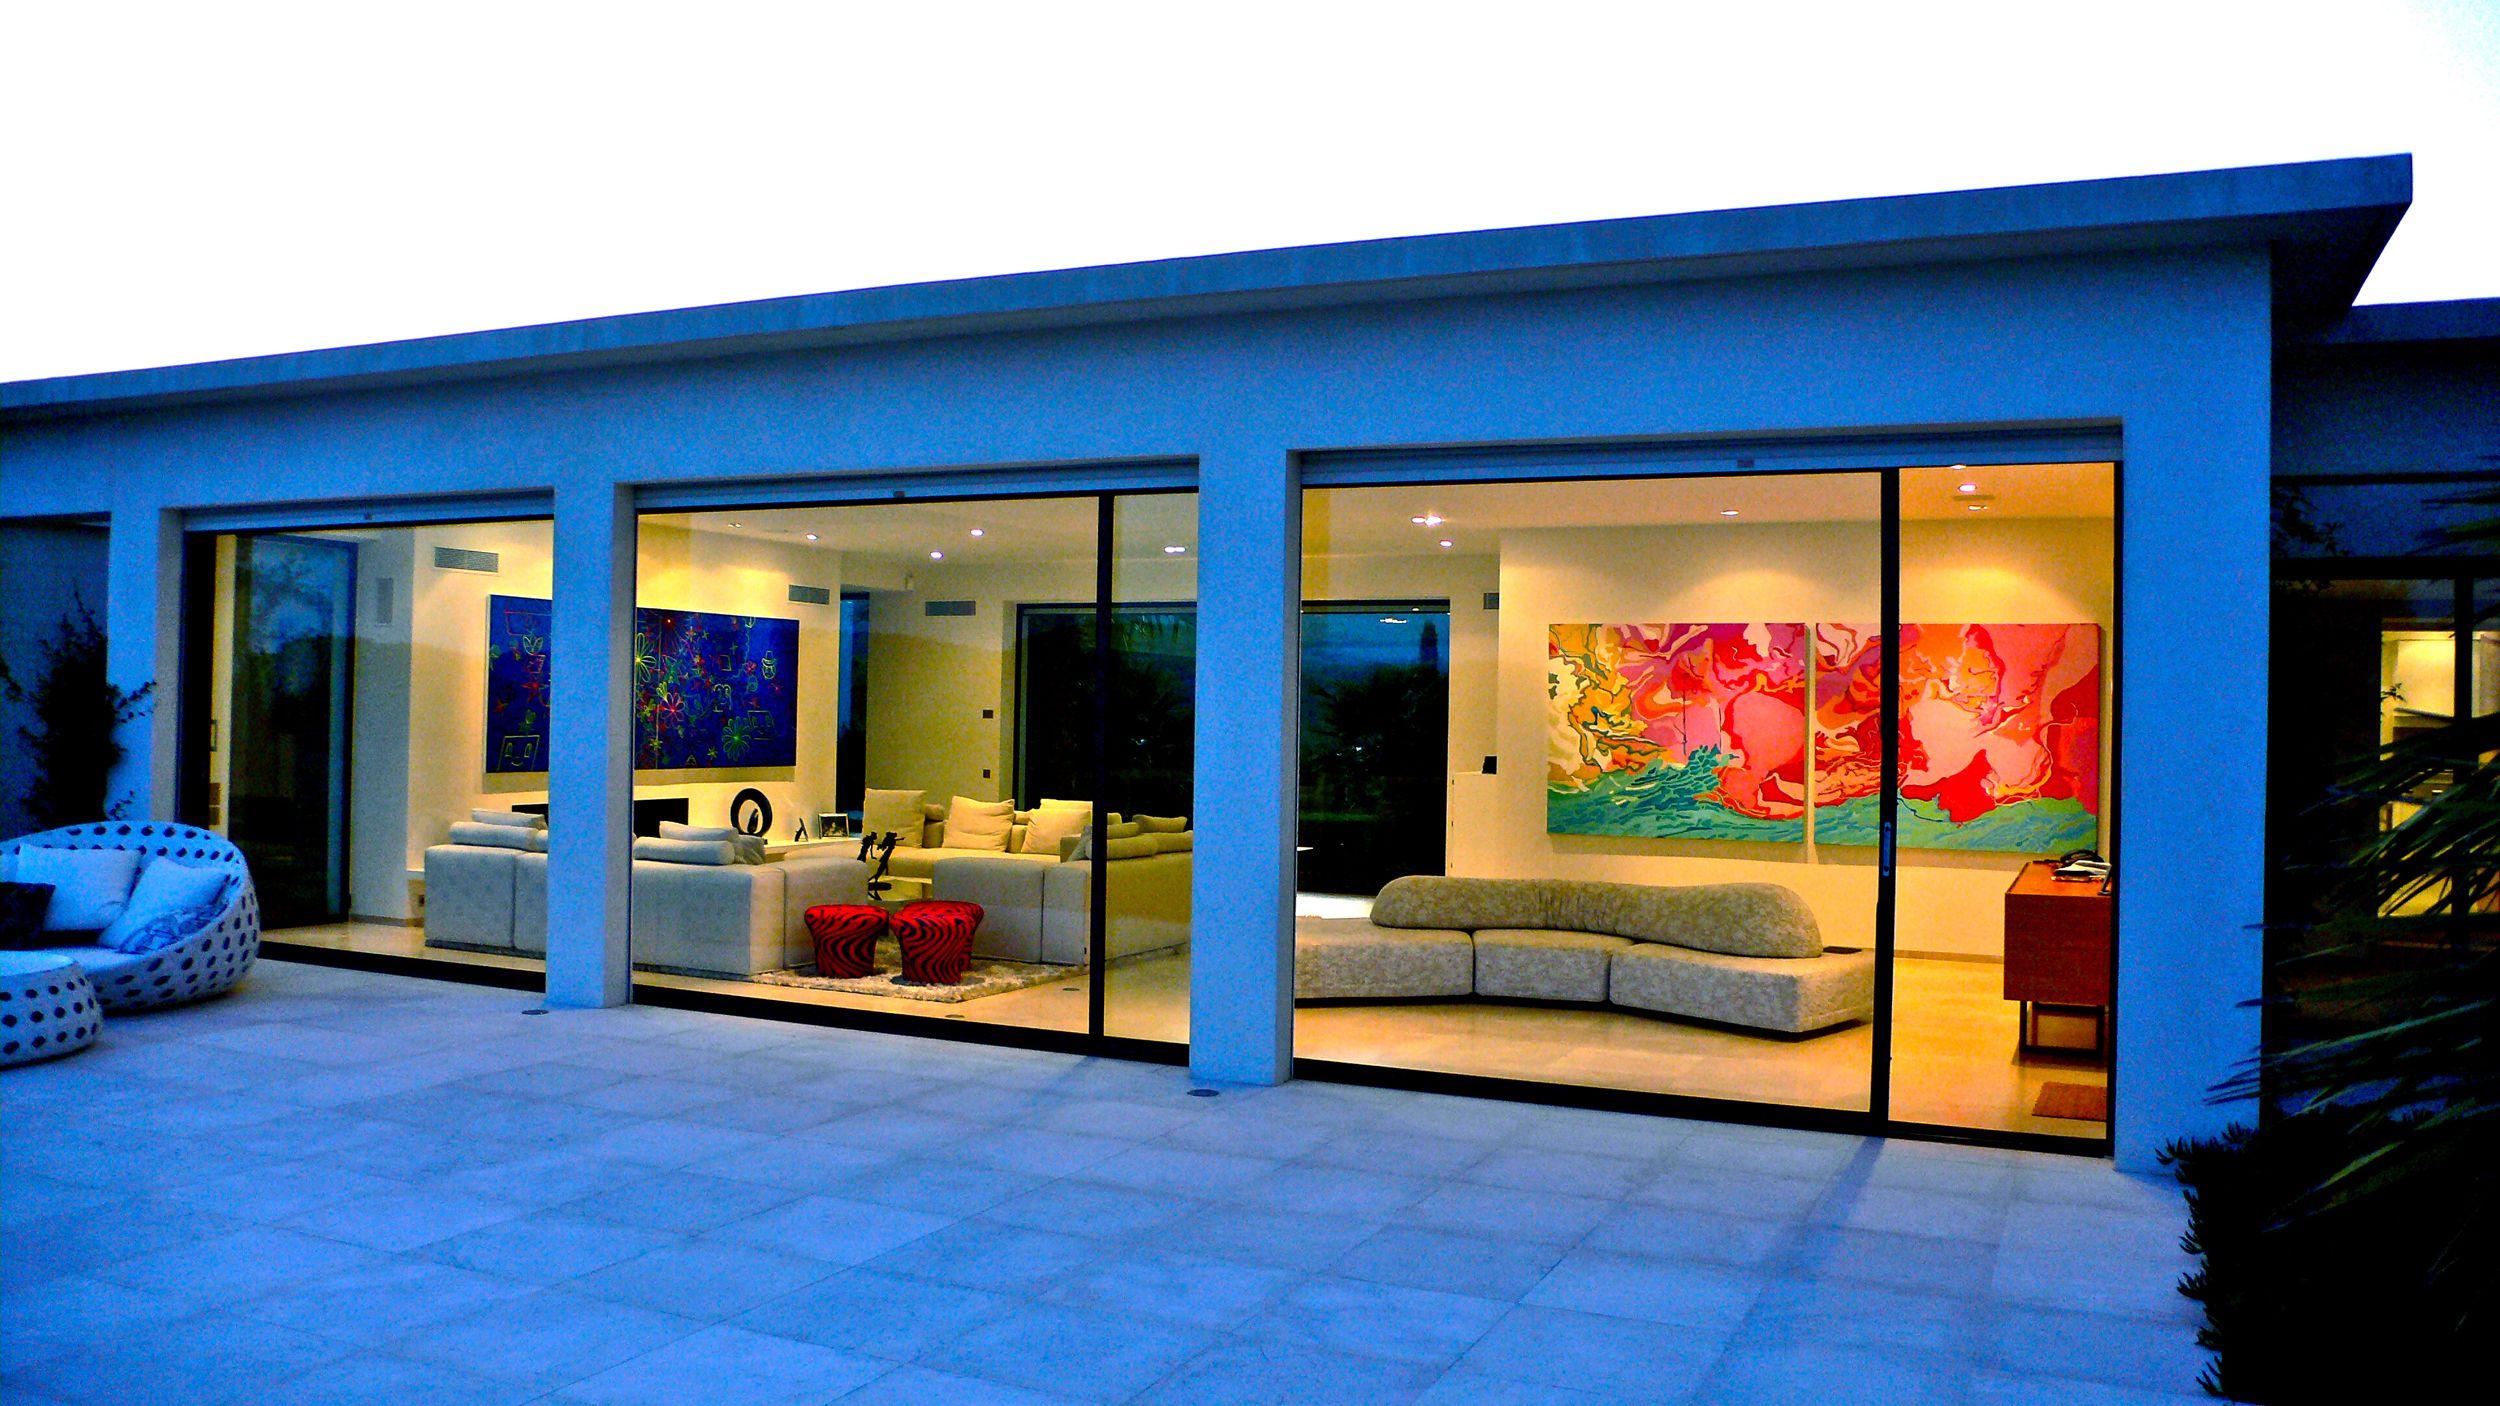 Oona Ratcliffe Private Collection: Hamptons, NY  #interiordesign #design #interior #home #decor #furniture